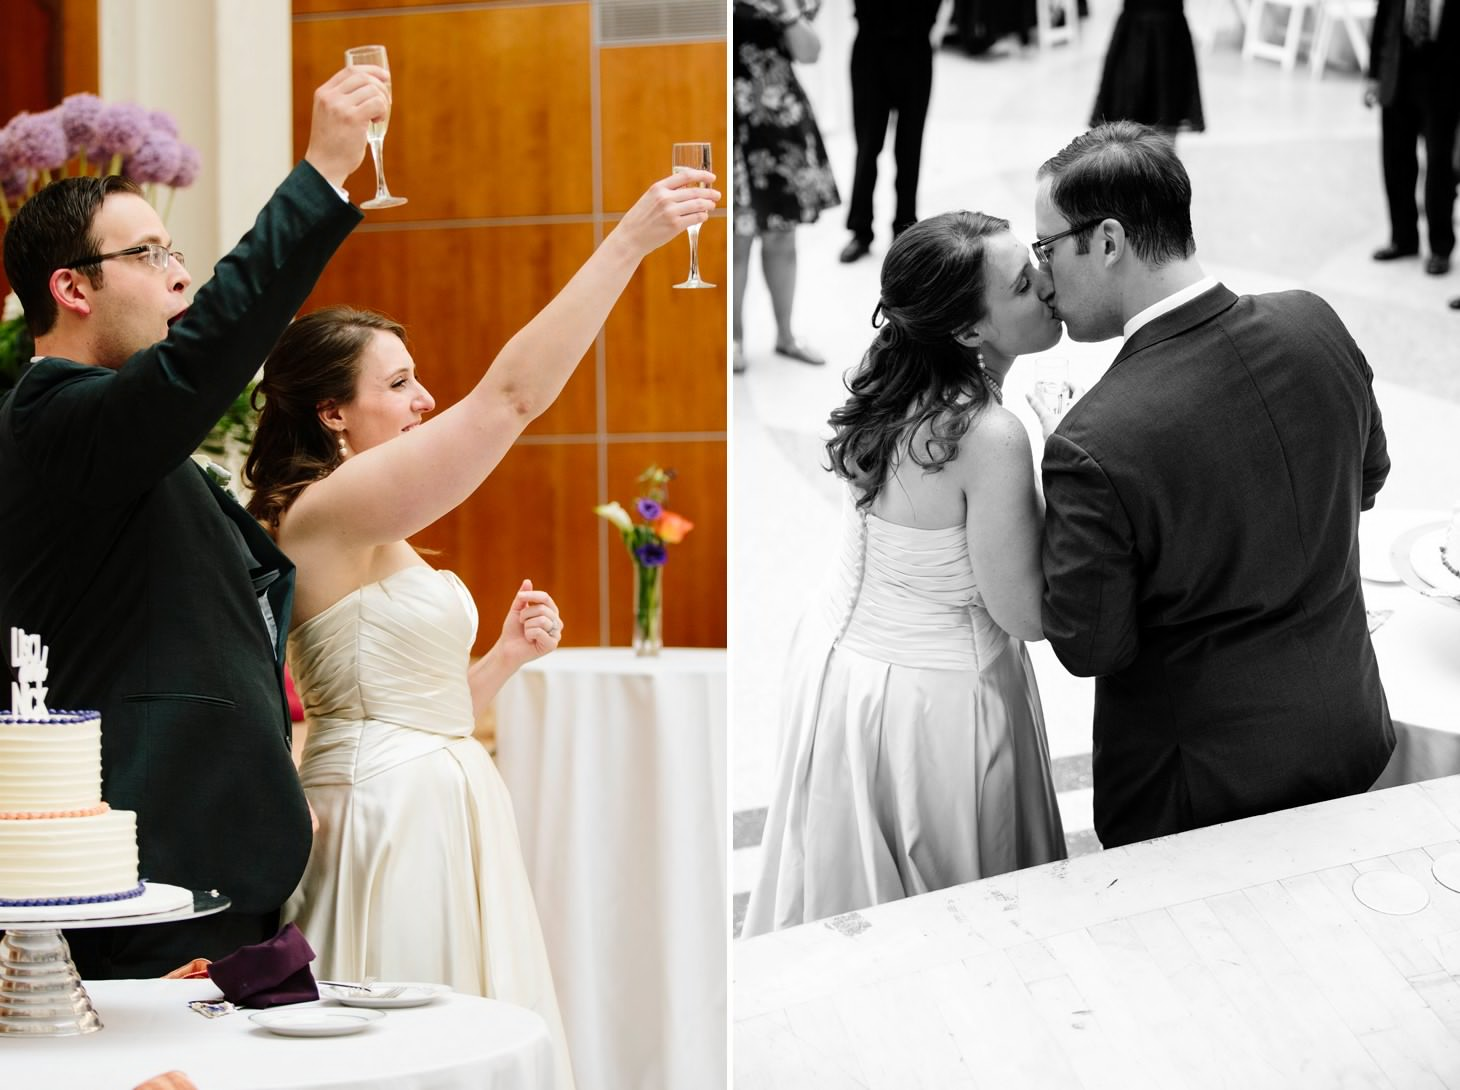 064-nyc-wedding-photographer-hoboken-waterfront-wedding-photos-smitten-chickens.jpg